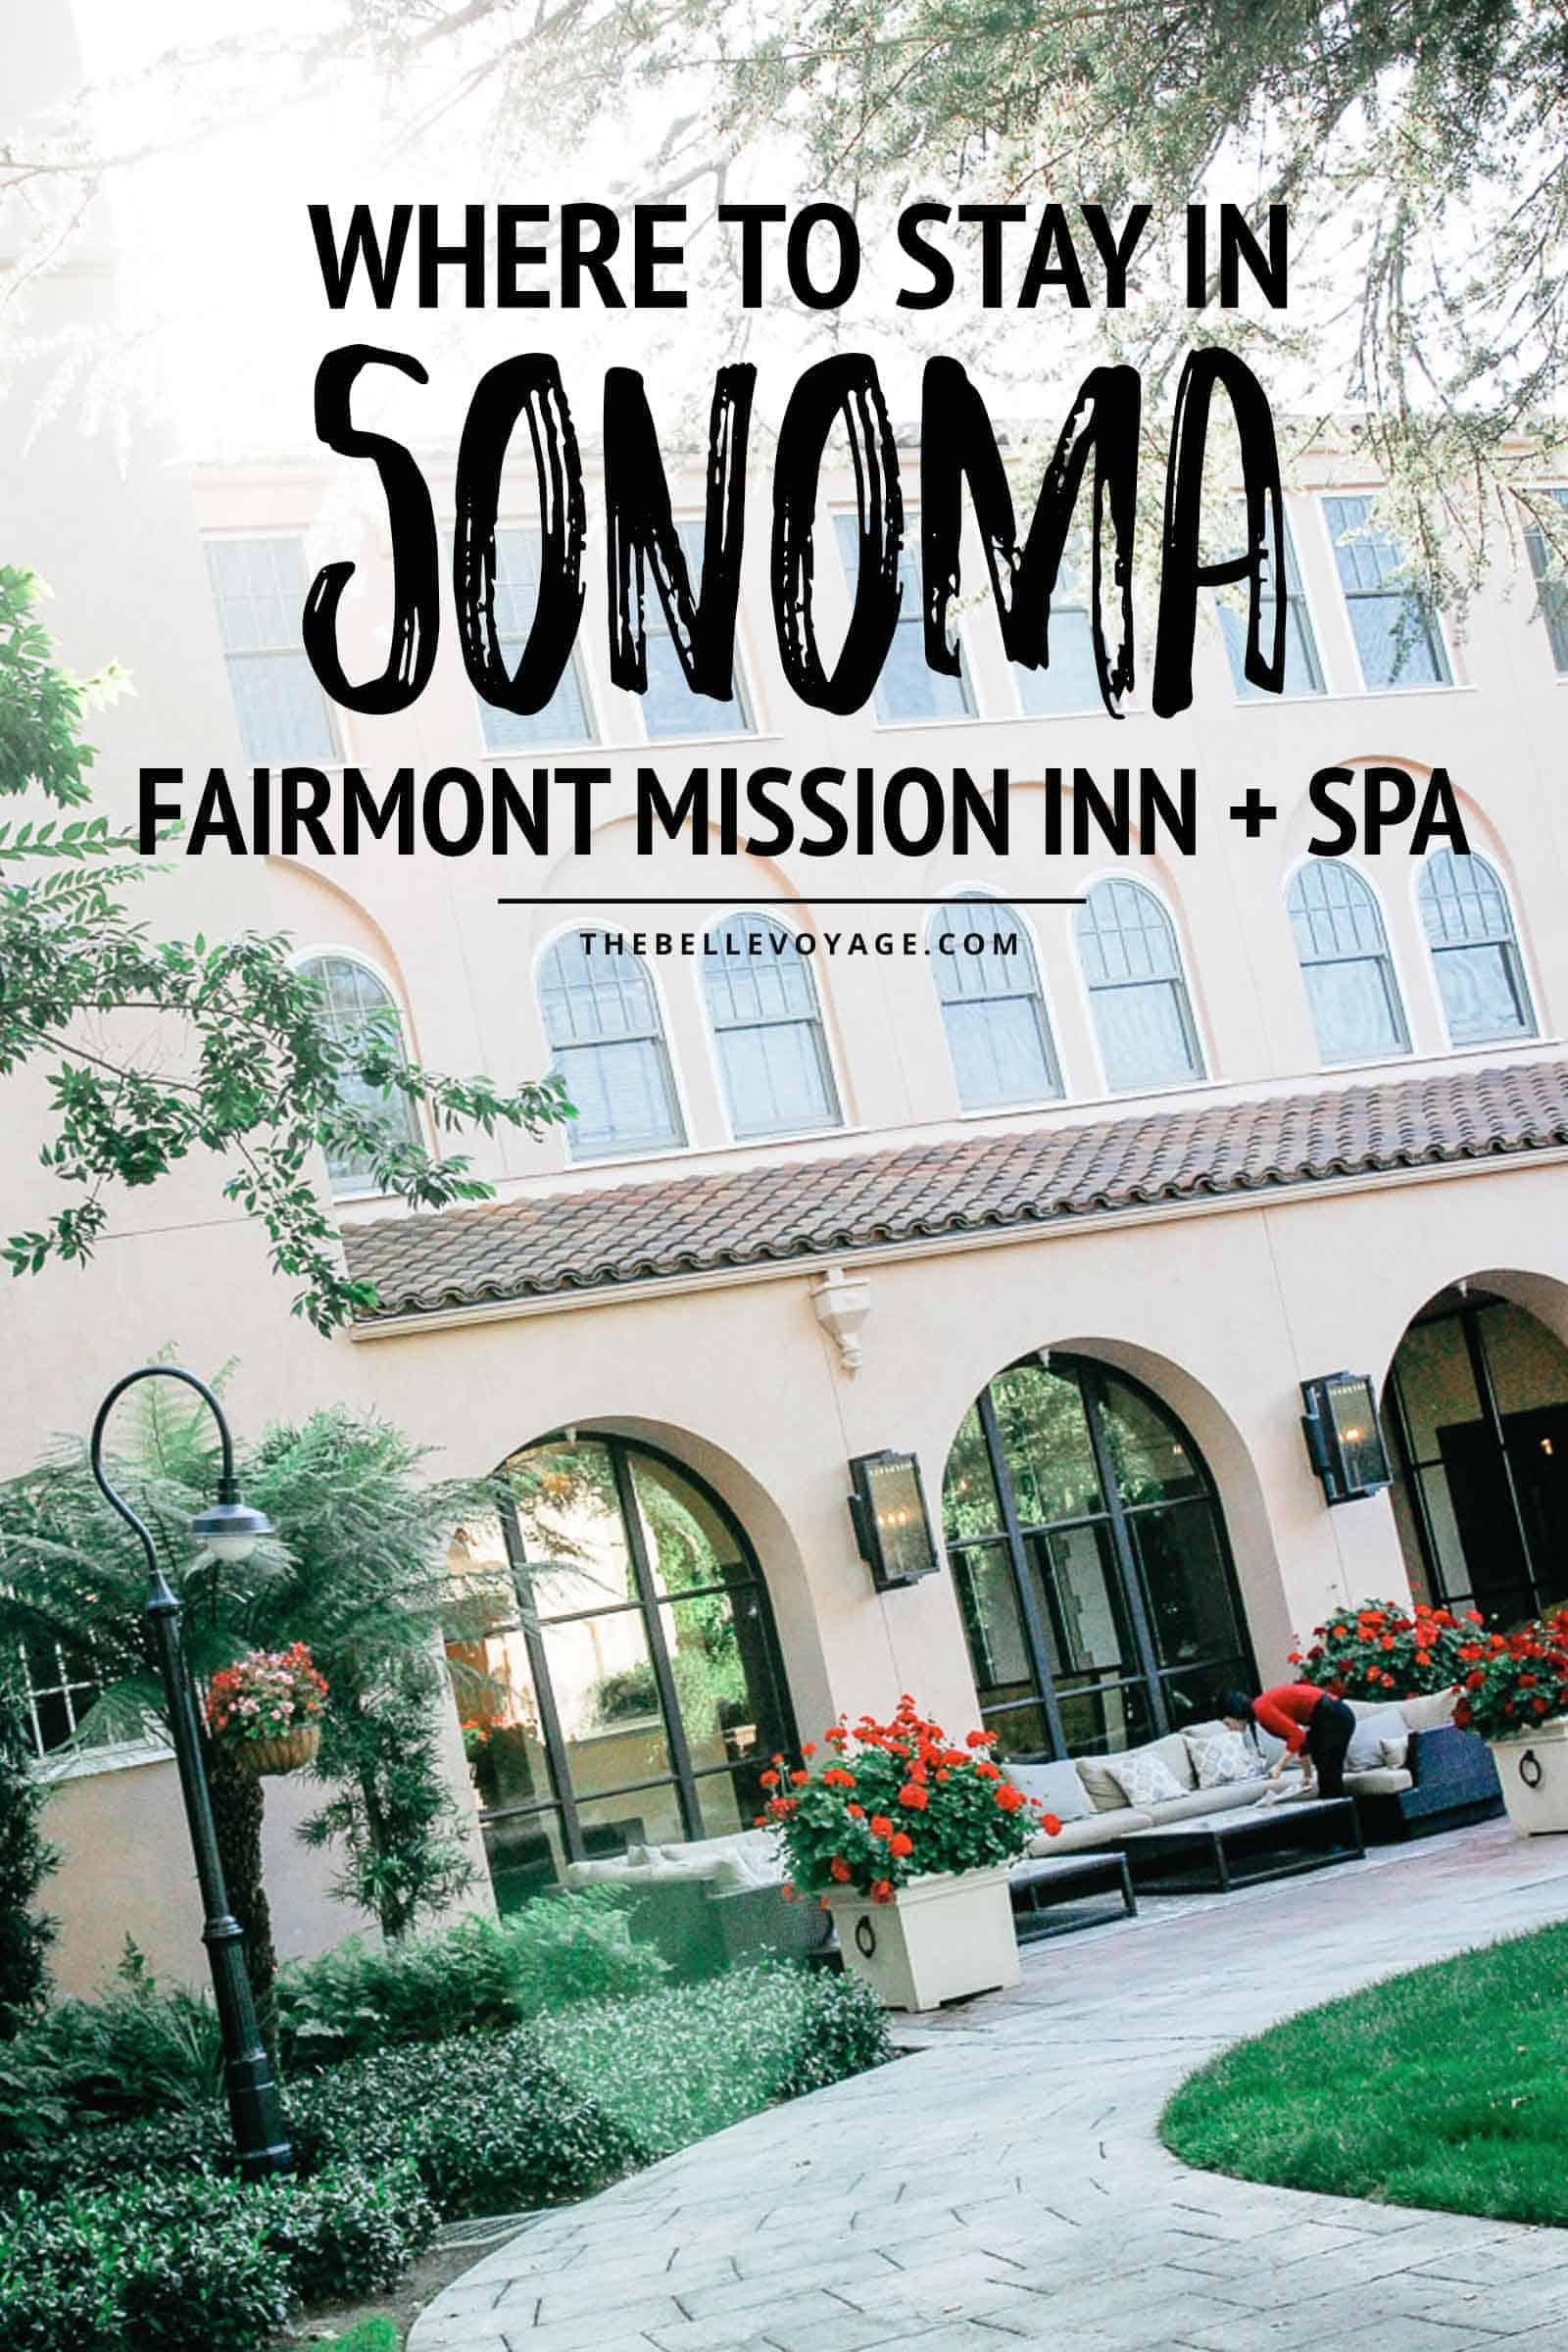 sonoma valley california hotels